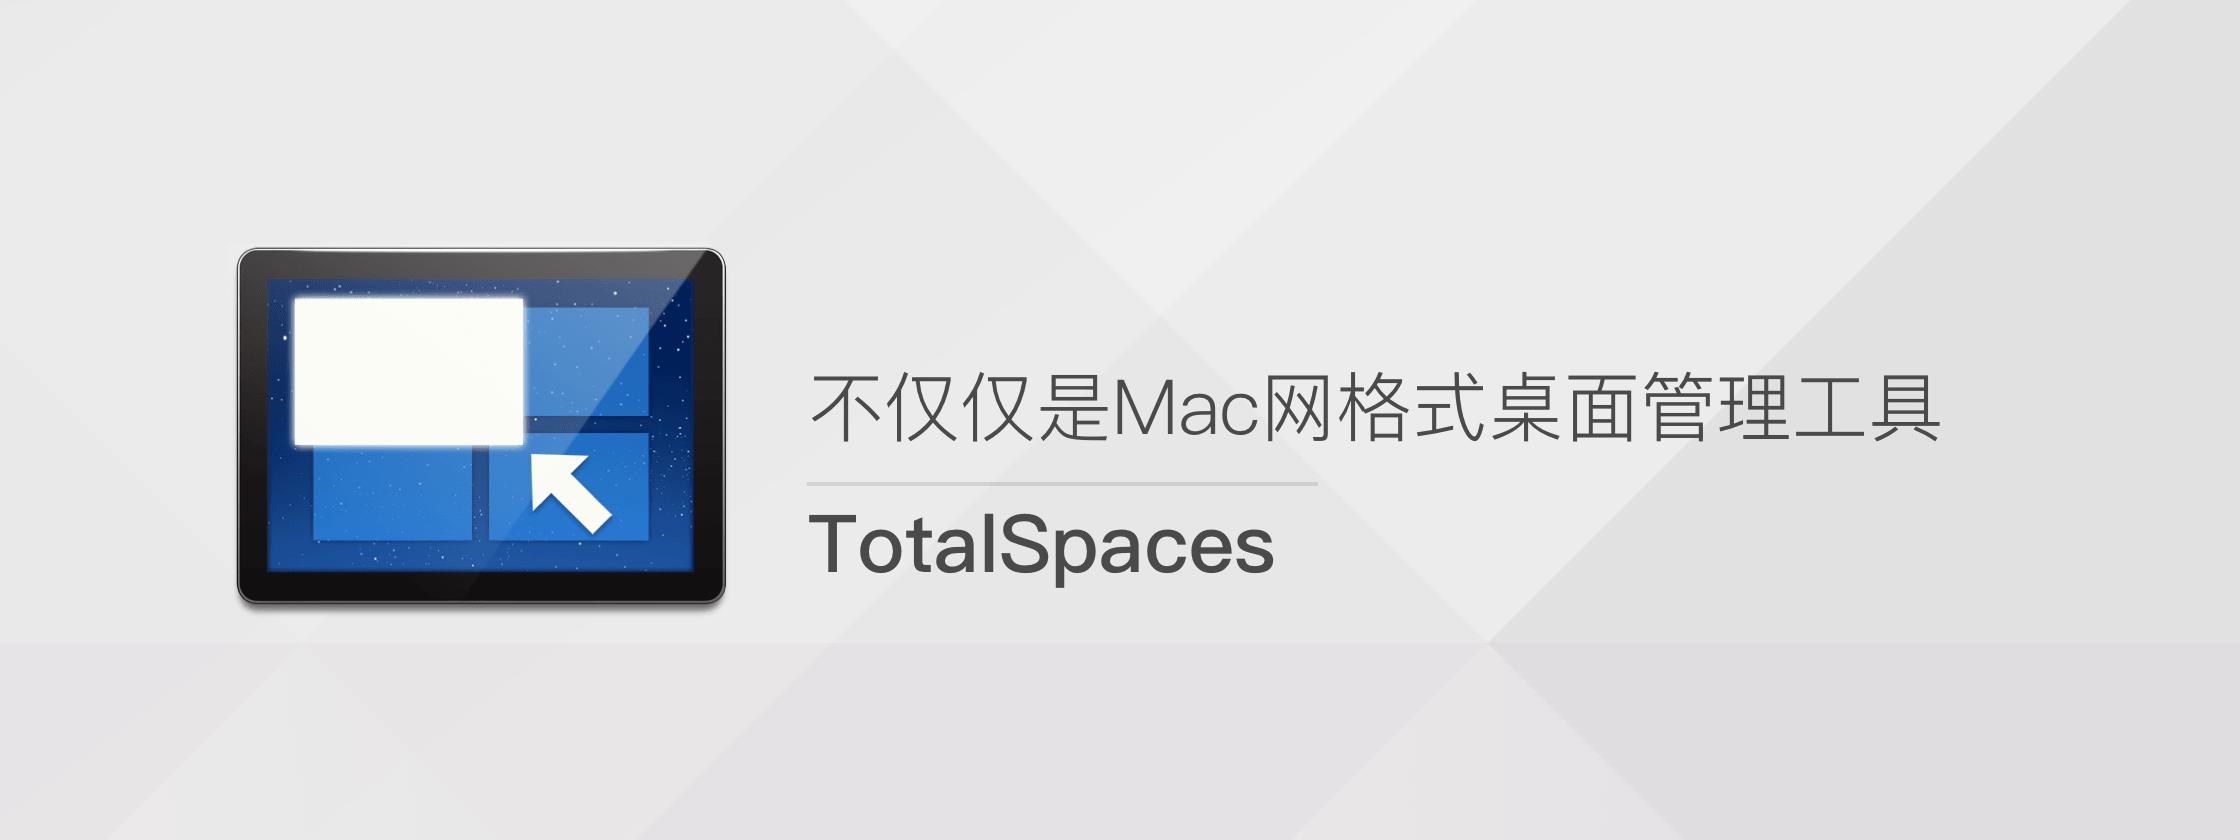 TotalSpaces – 不仅仅是 Mac 网格式桌面管理工具